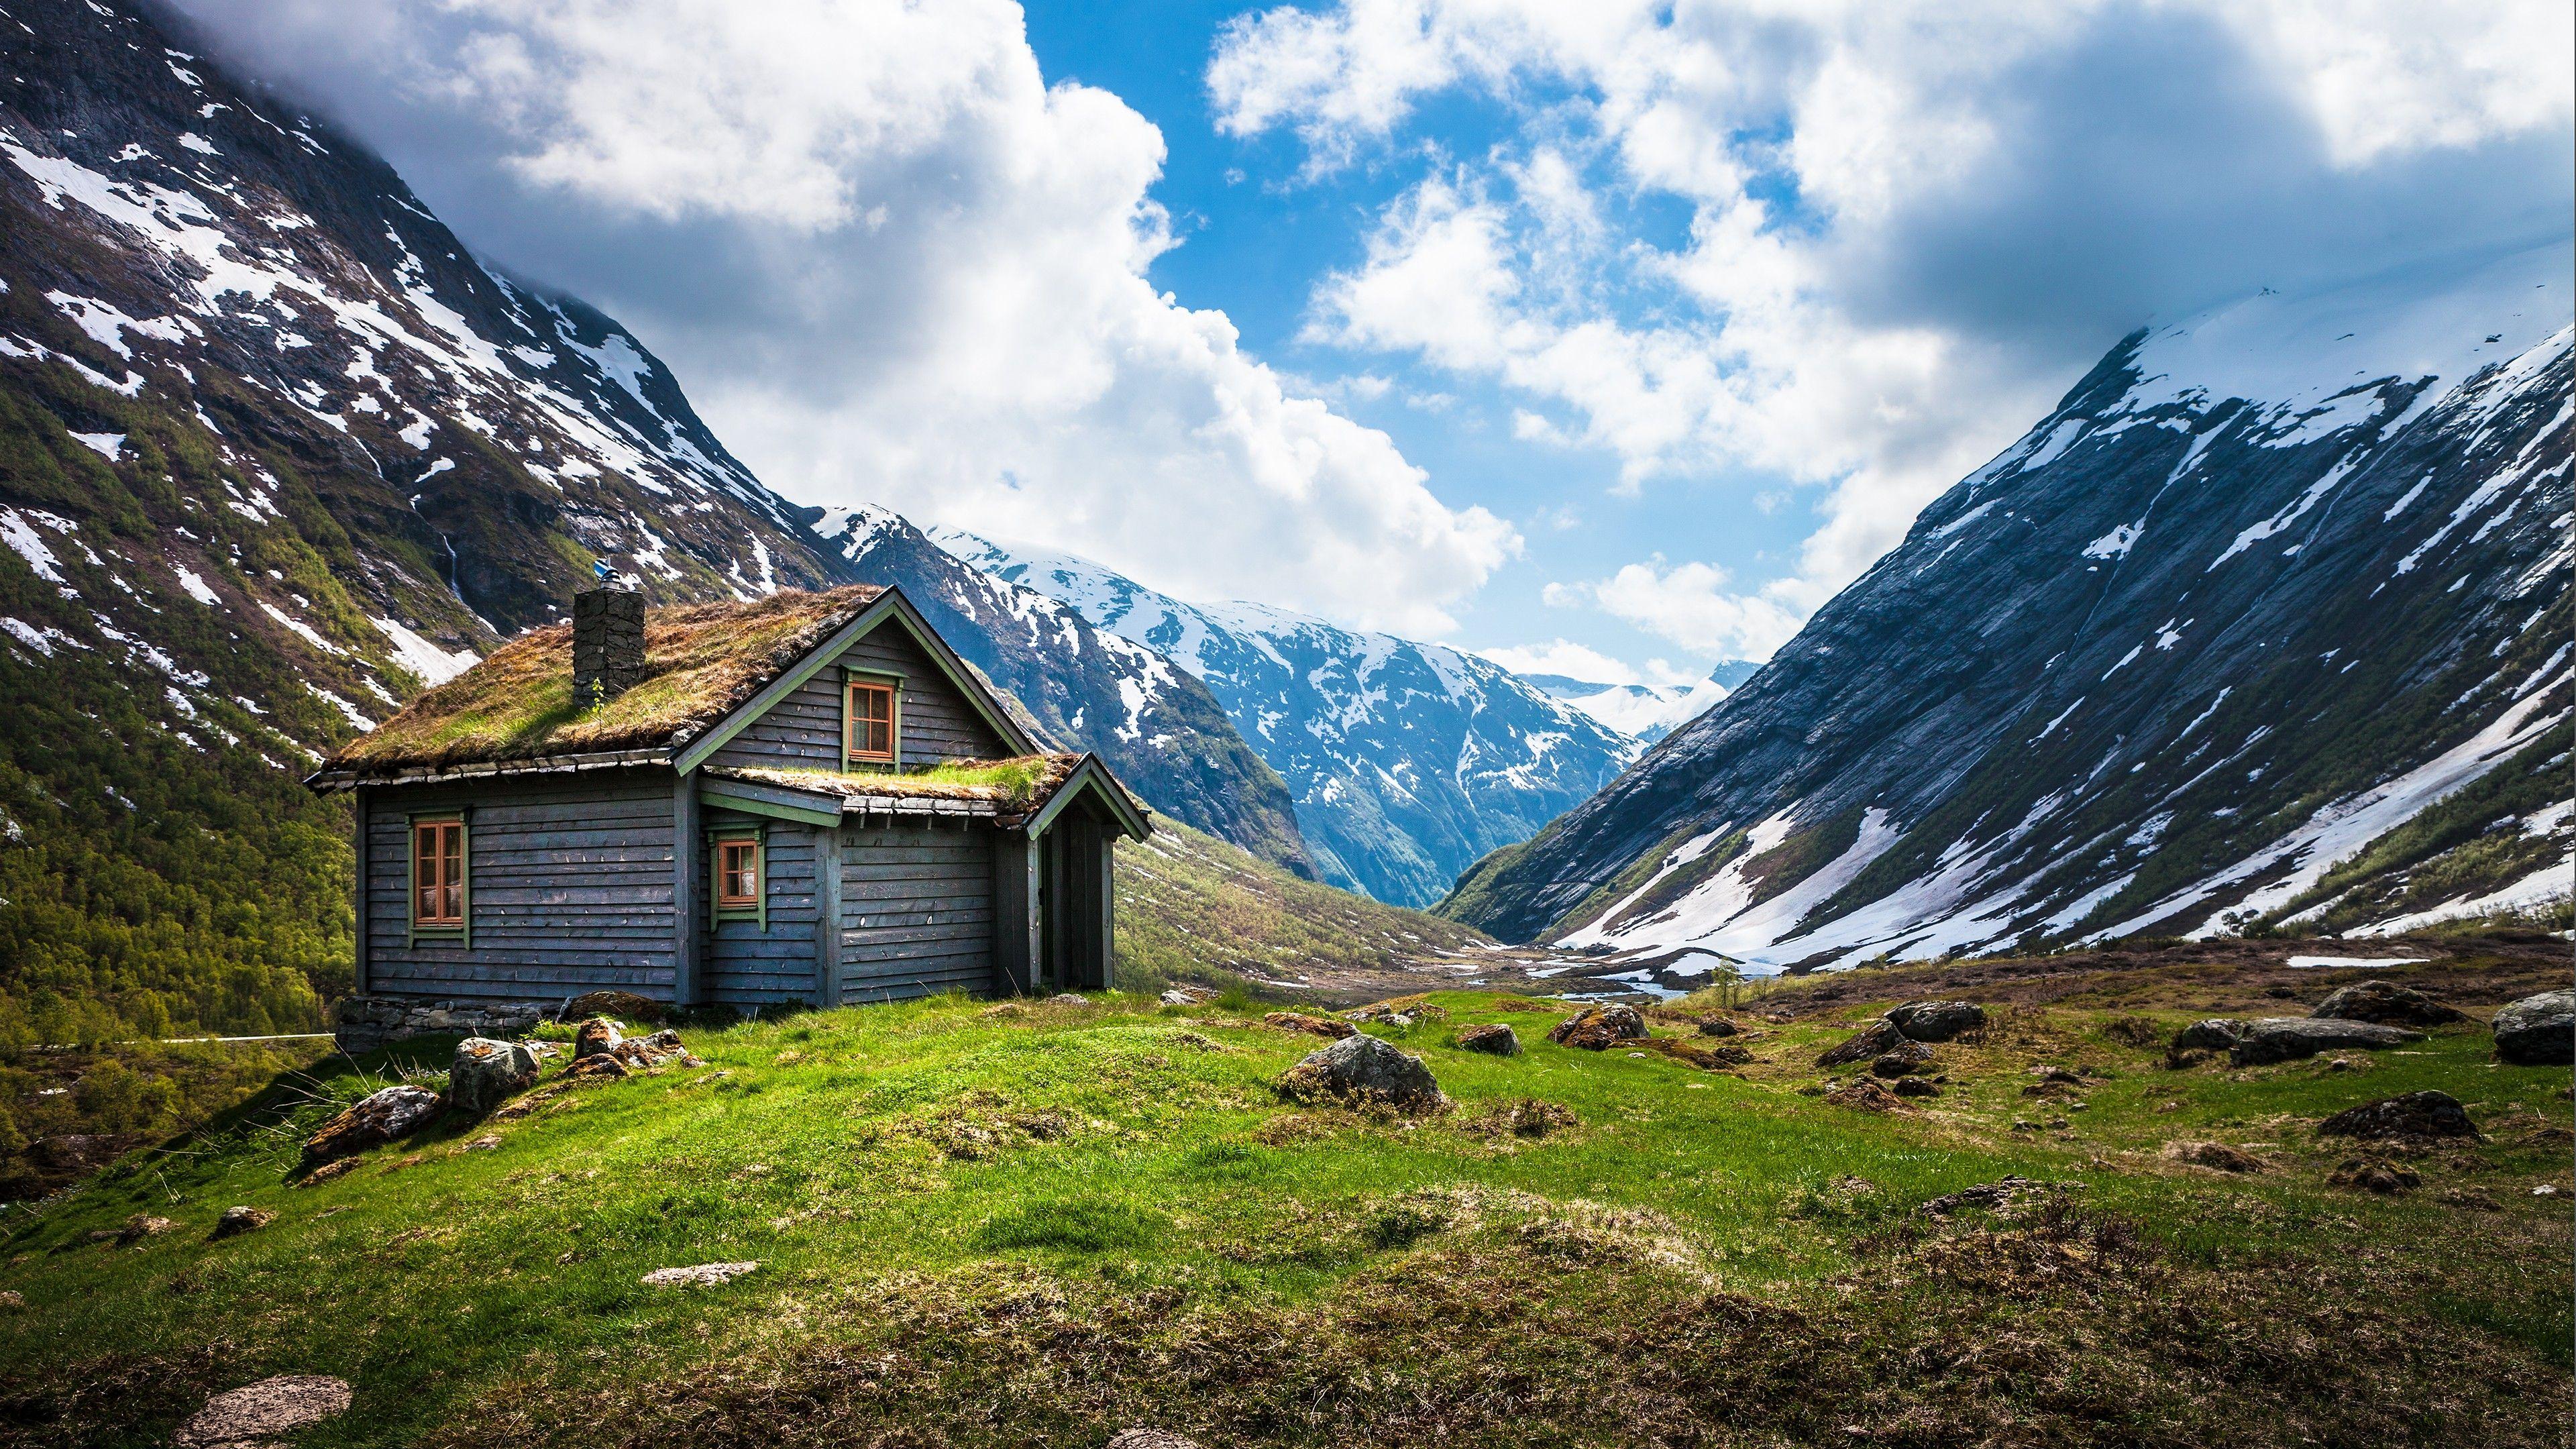 Norway 4k Hd Wallpaper Geiranger Stryn Mountain Clouds House